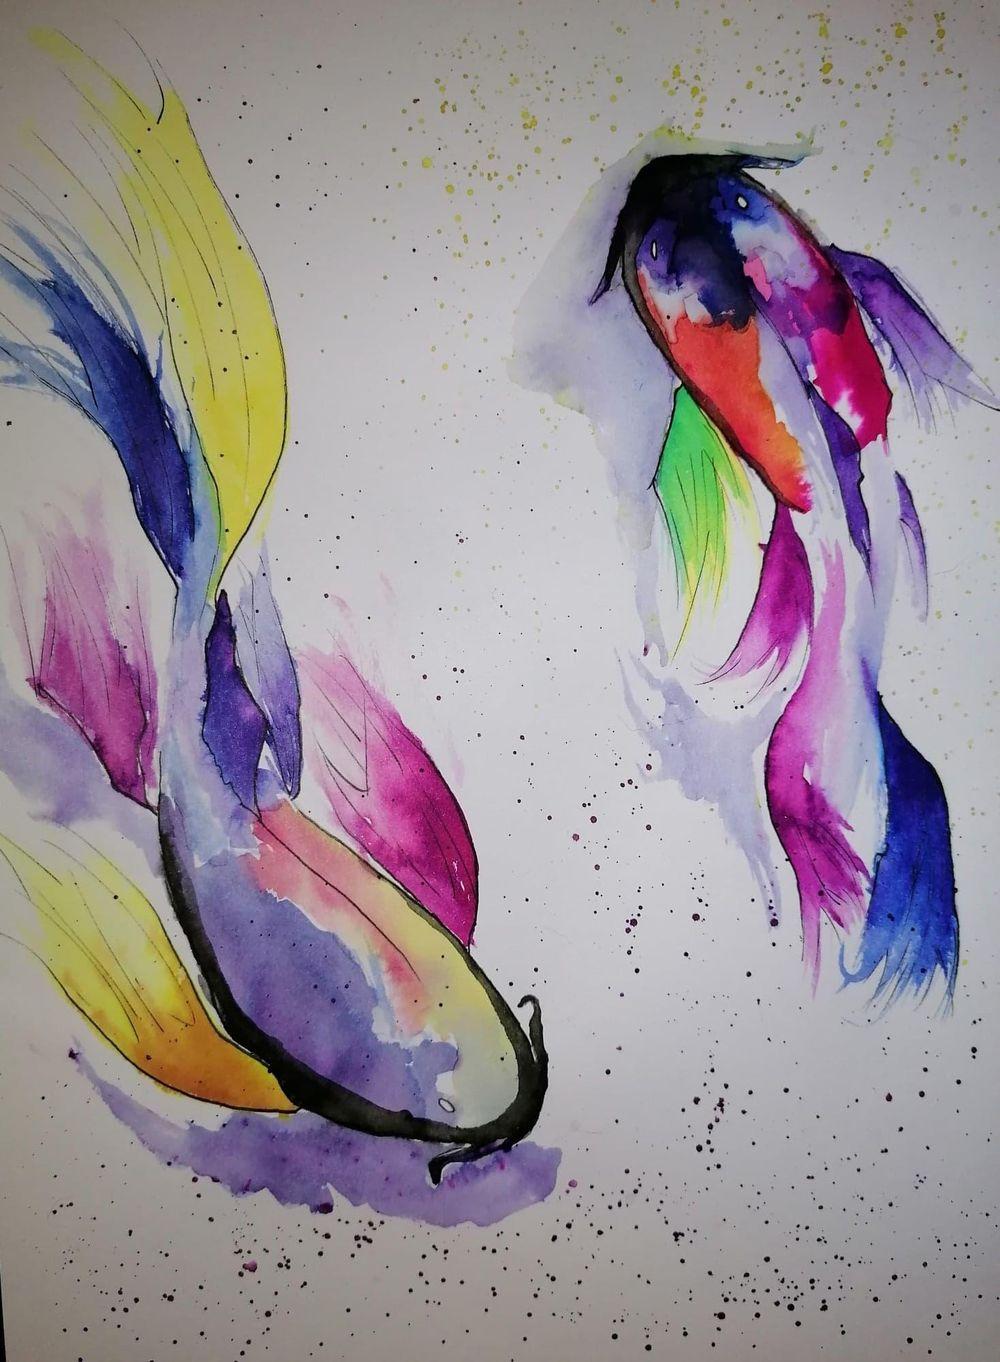 Koi Fish Liquid Watercolour - image 1 - student project